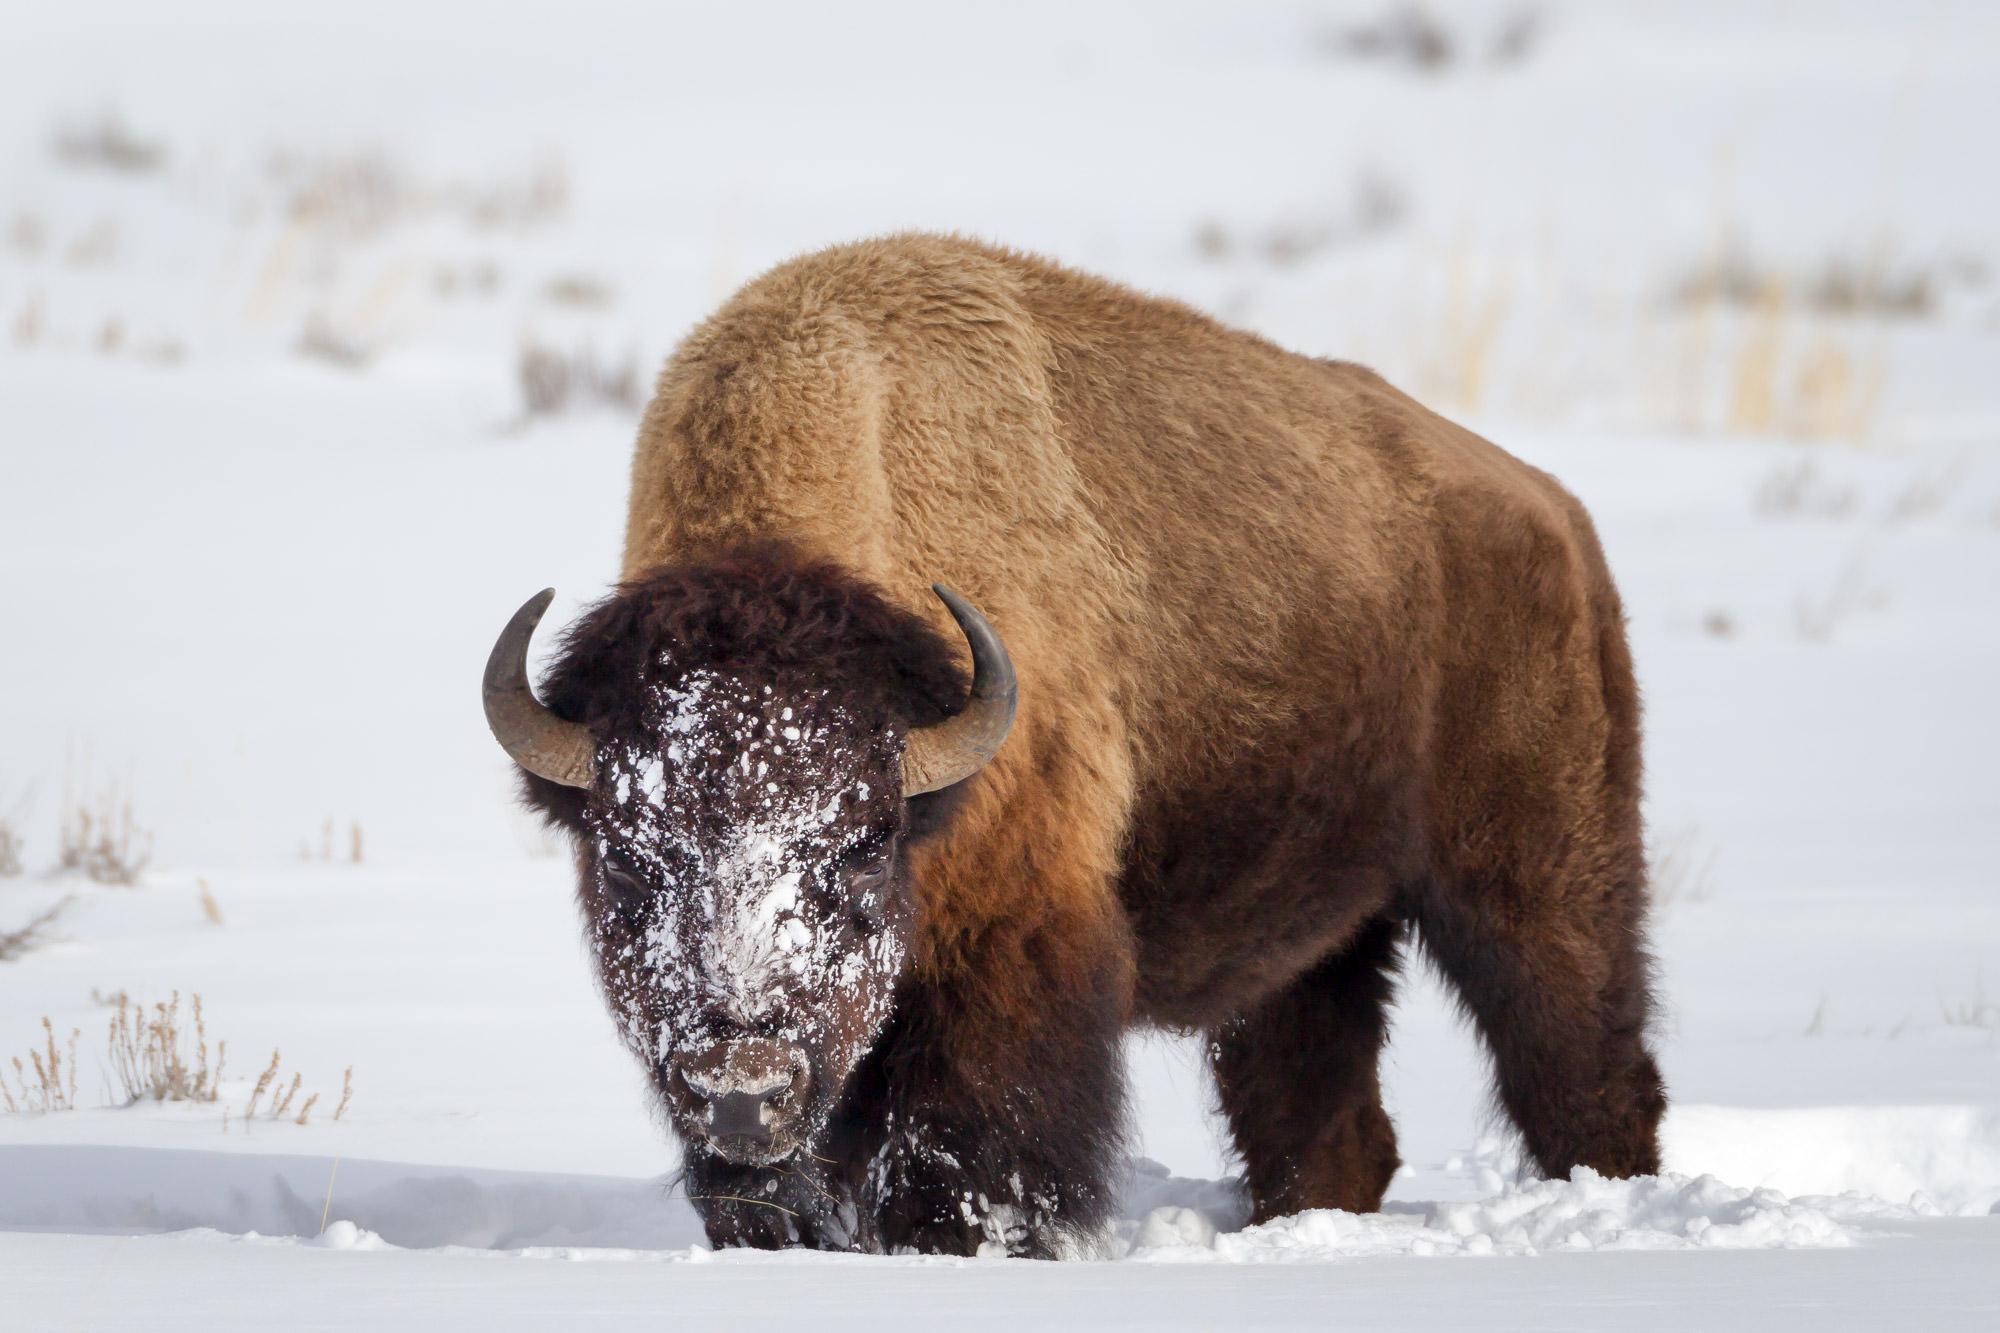 Wyoming, Bison, Winter, Yellowstone, snow, limited edition, photograph, fine art, wildlife, photo